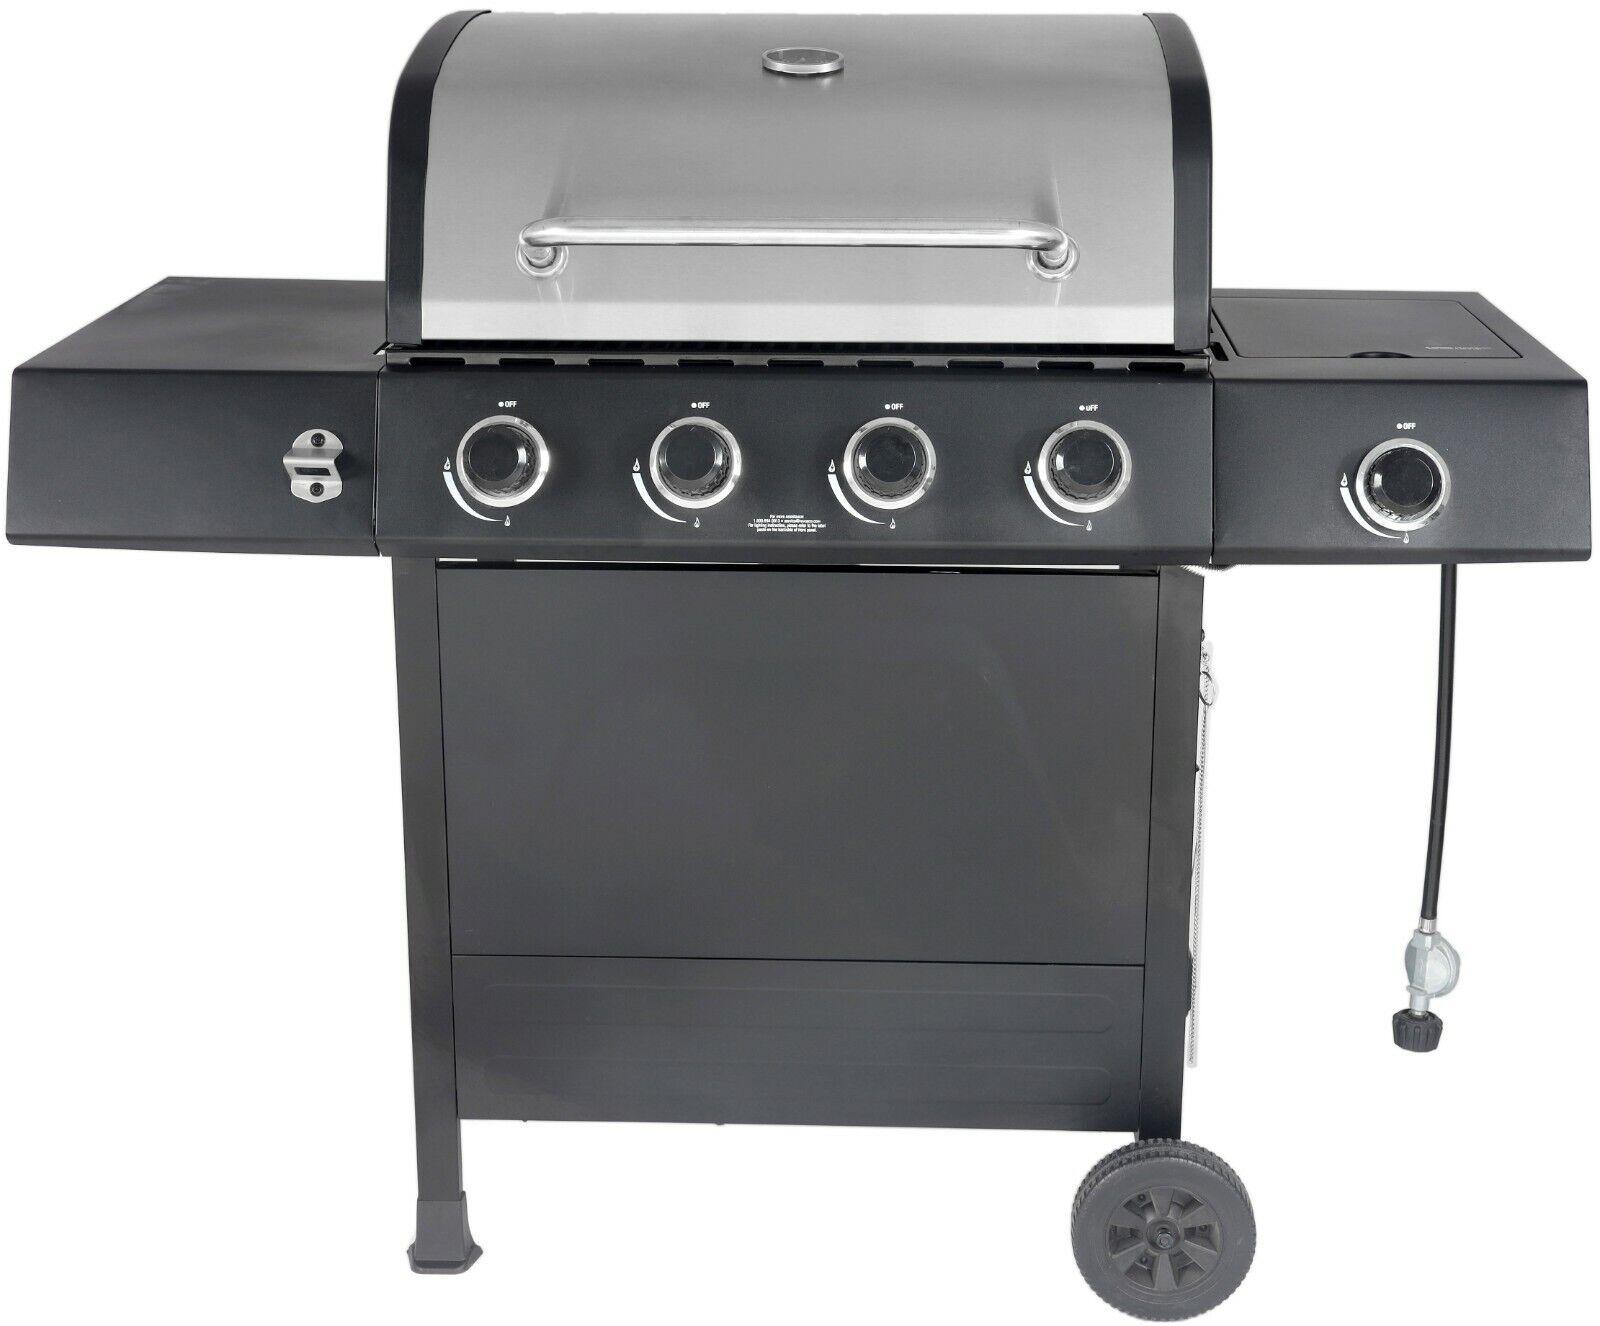 RevoAce GBC1748WS 4 Burner LP Gas Grill with Side Burner Gre